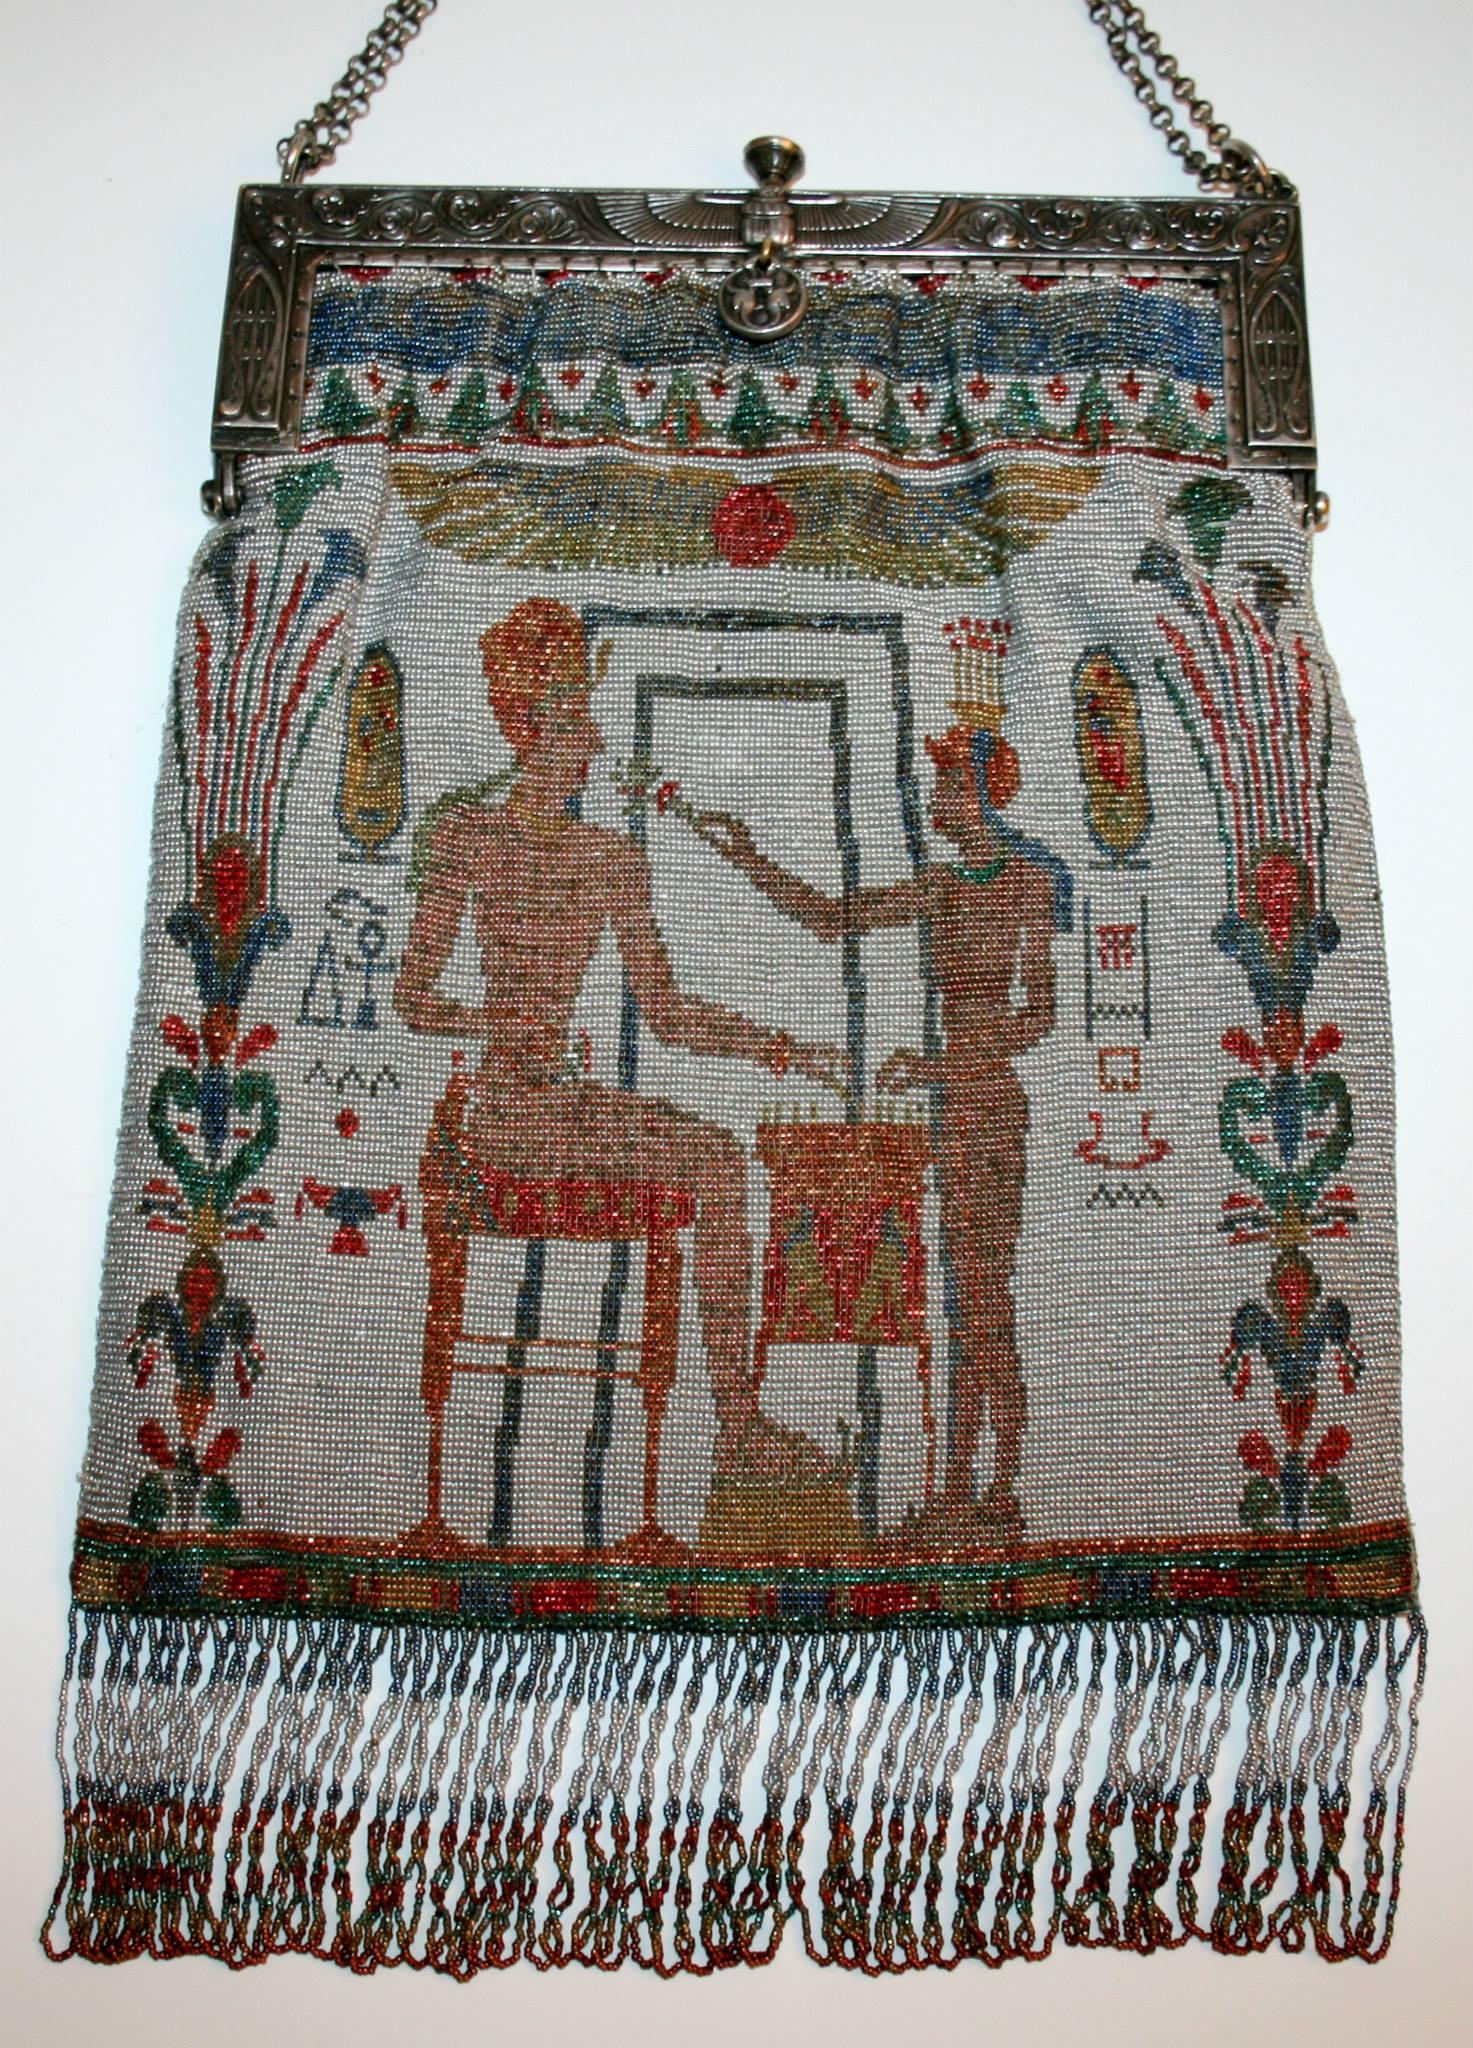 Egyptian Revival beaded purse